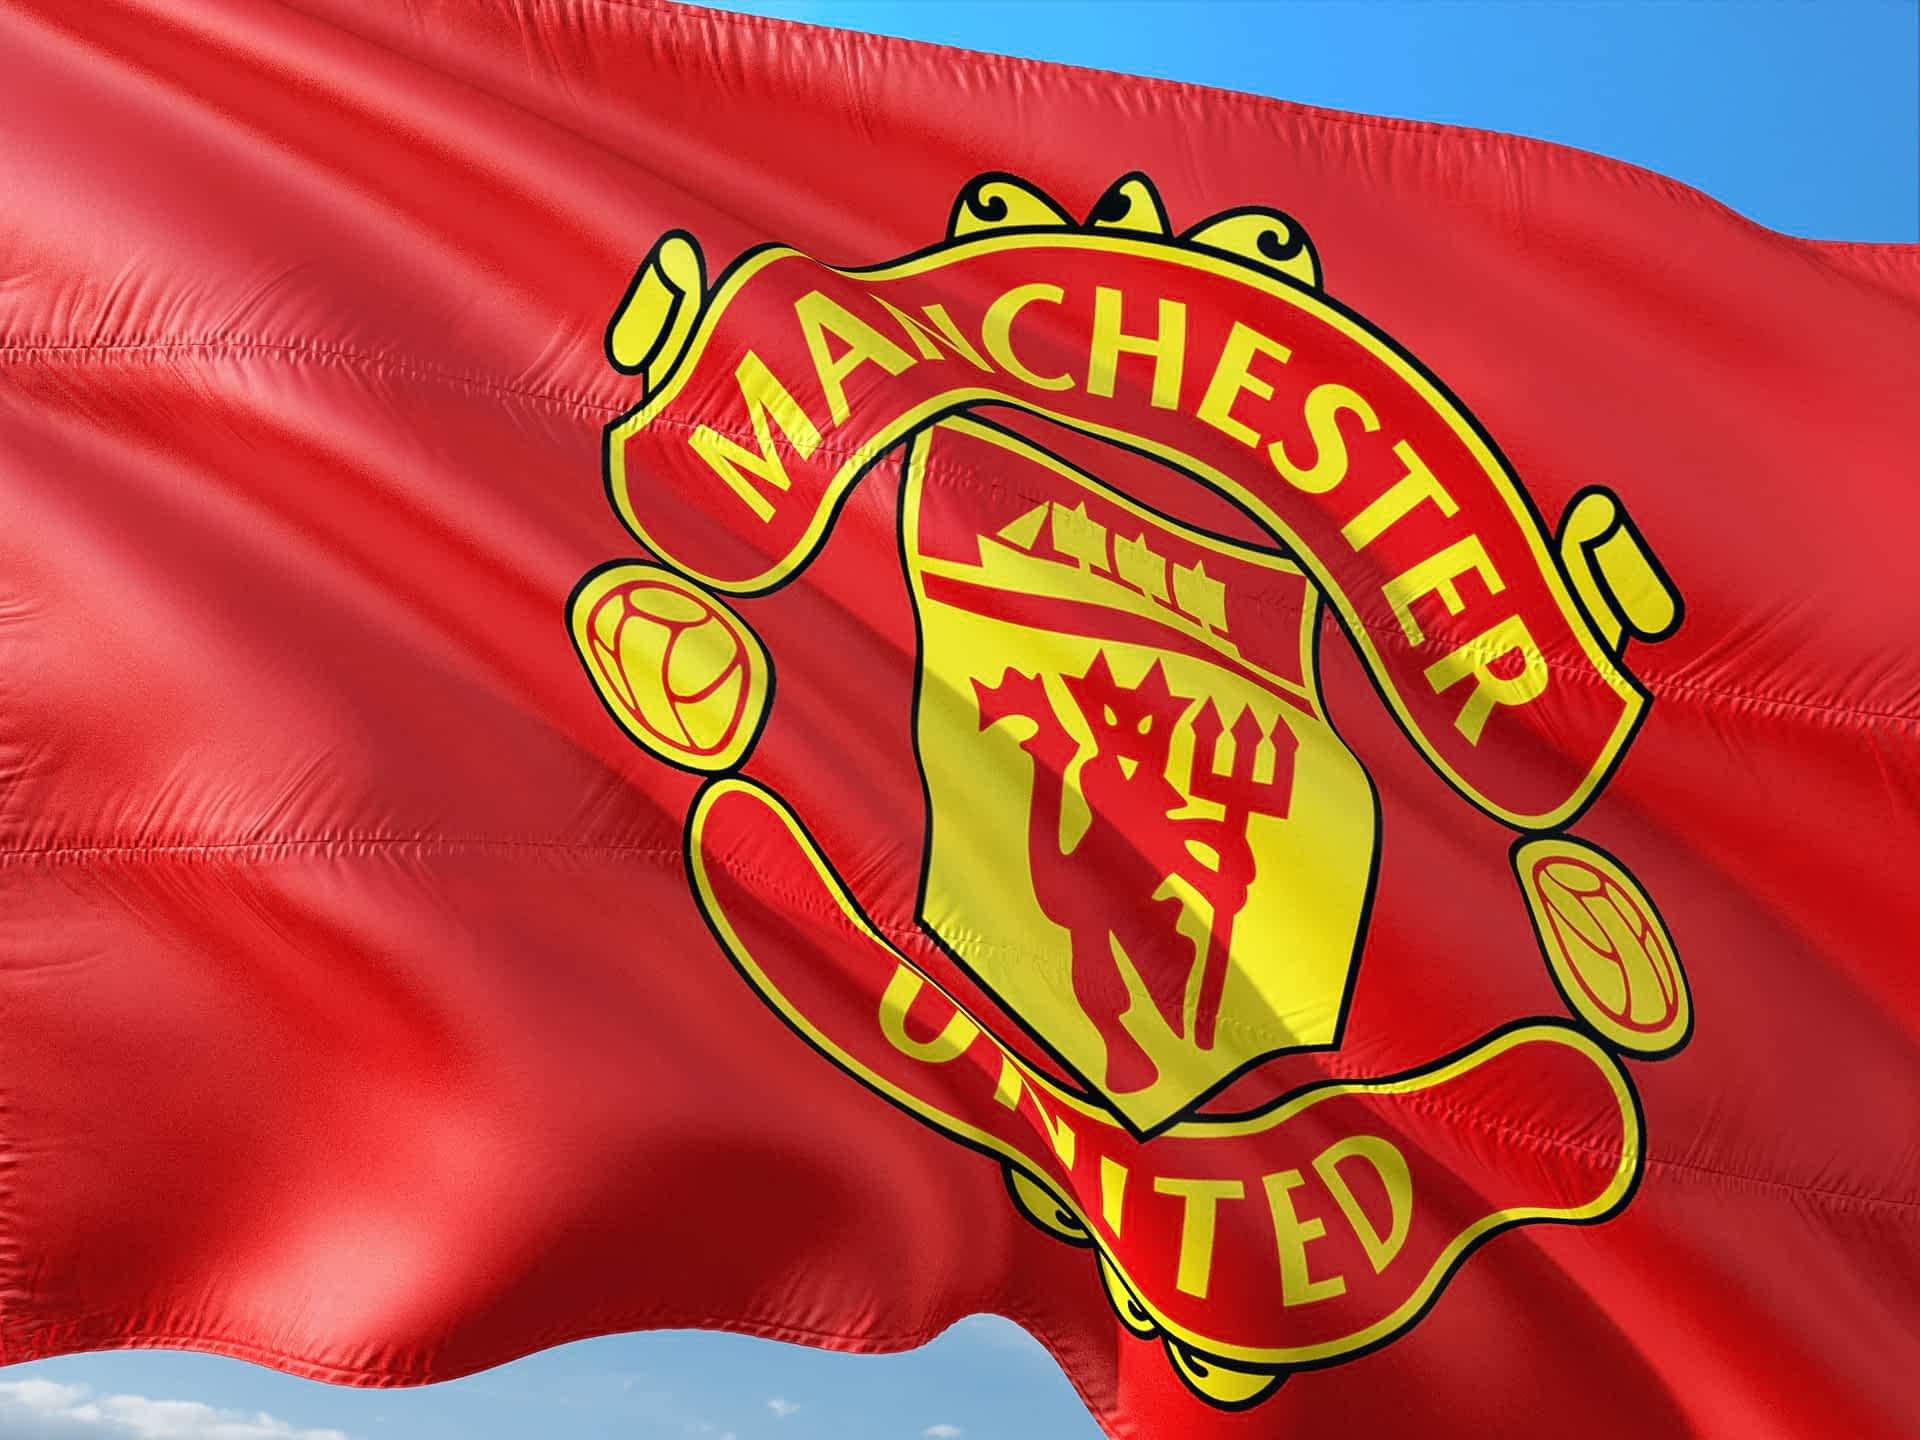 Манчестер Юнайтед футбольная команда фото